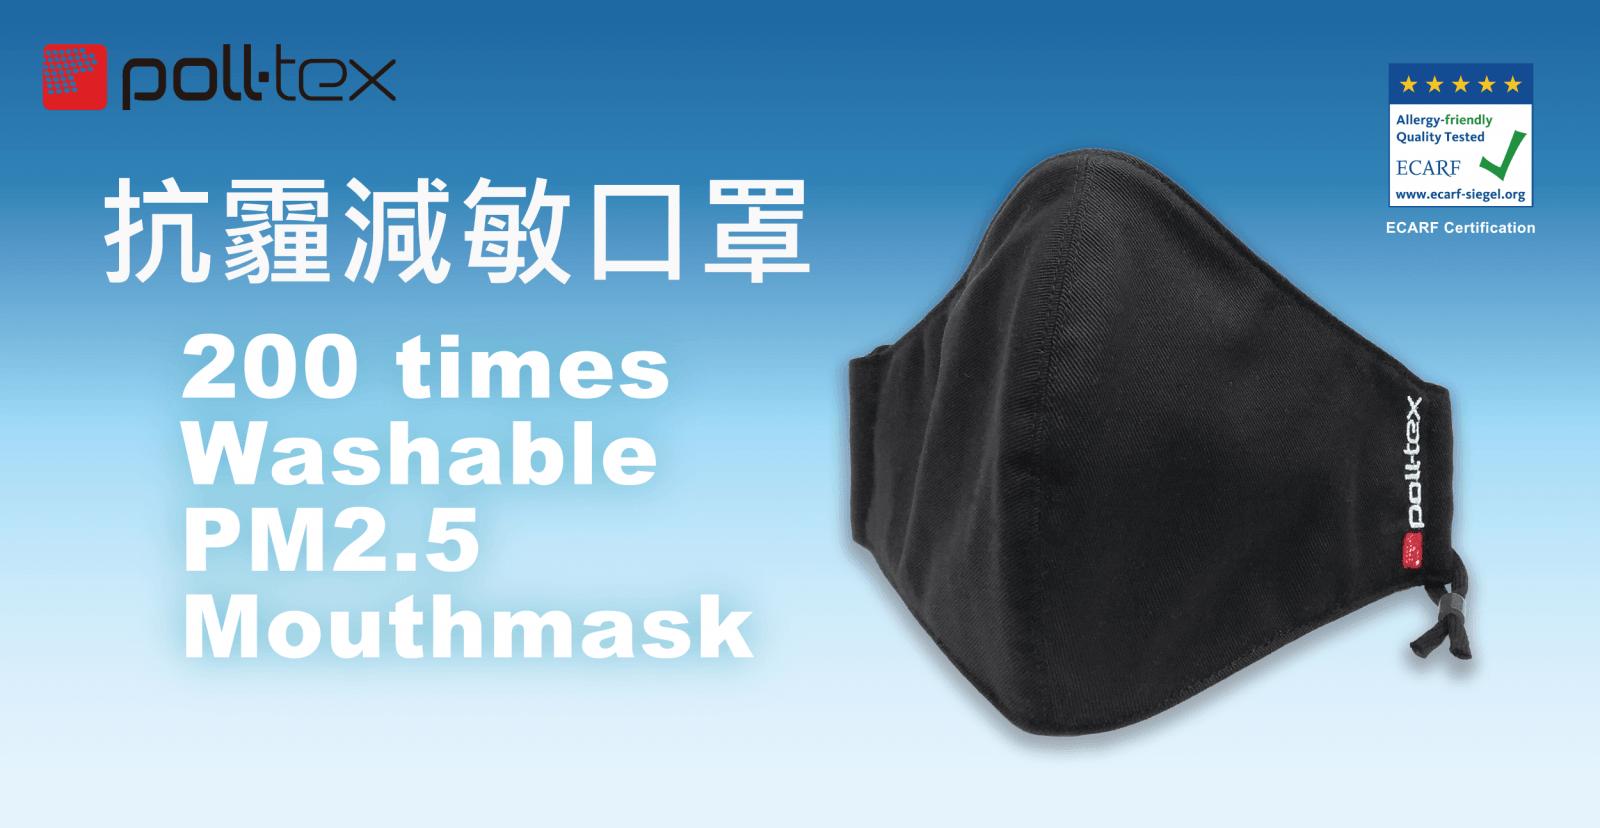 Poll-tex抗霾減敏口罩有效阻隔PM2.5可水洗200次